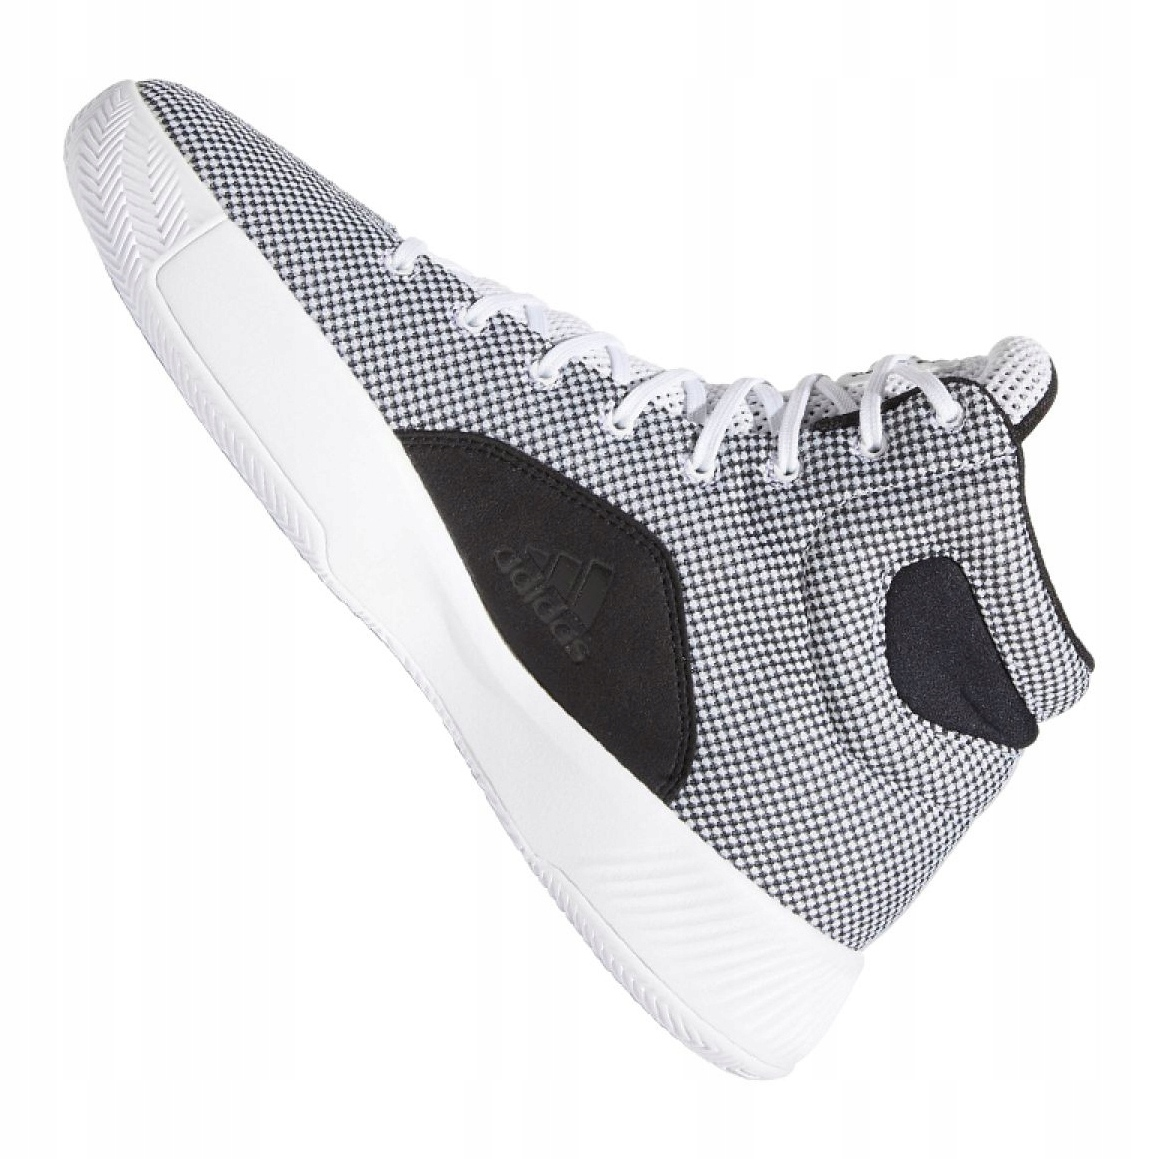 Adidas Pro Bounce Madness 2019 M BB9235 cipő fehér fehér